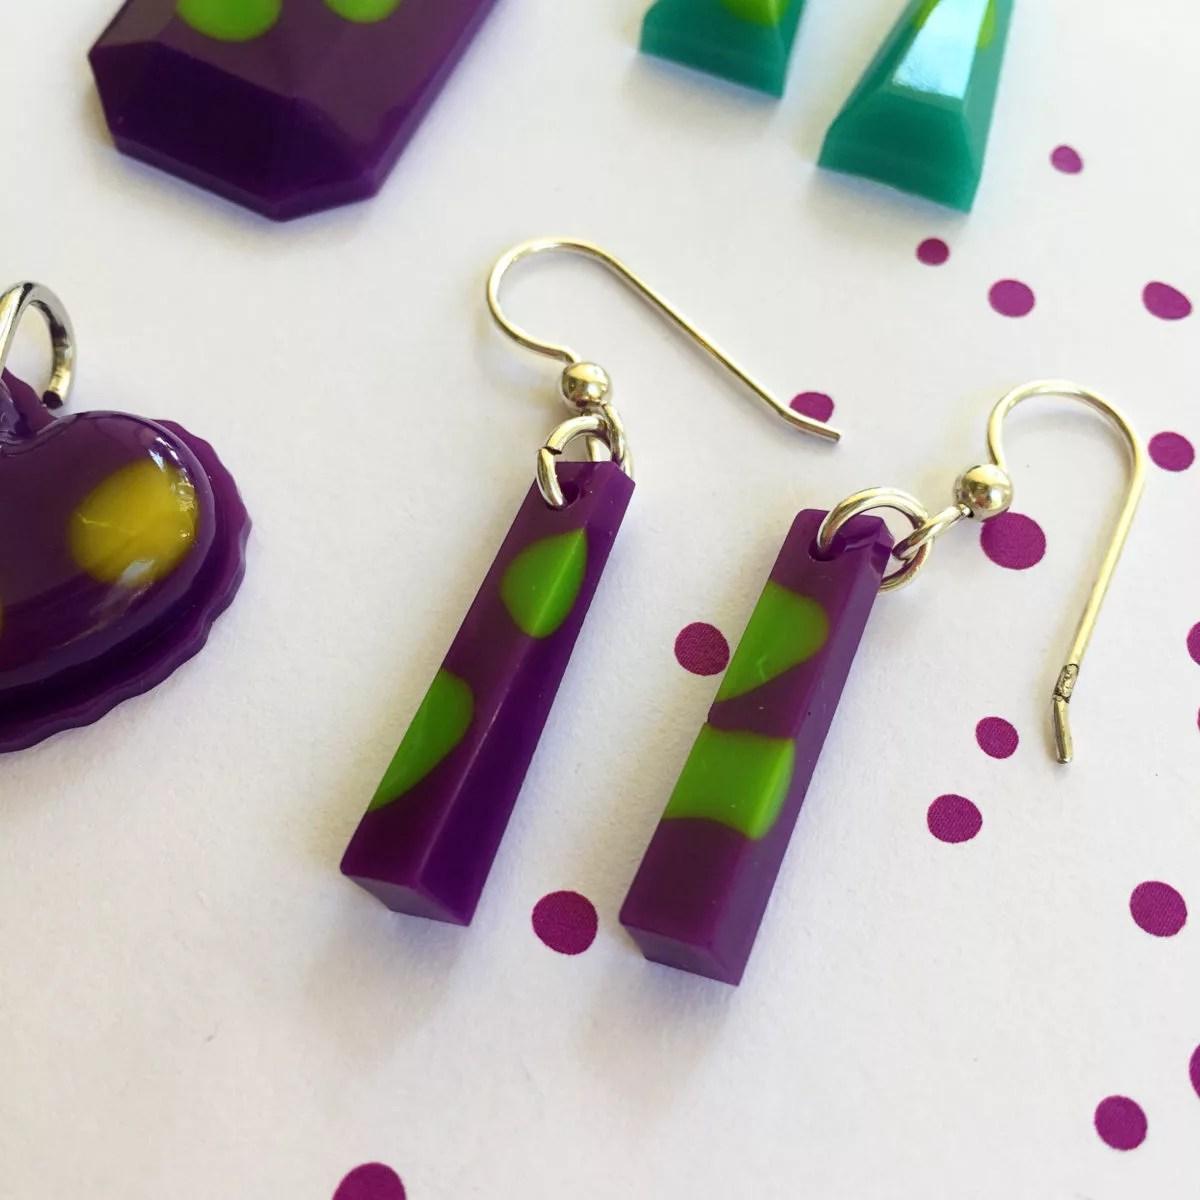 purple and green resin earrings